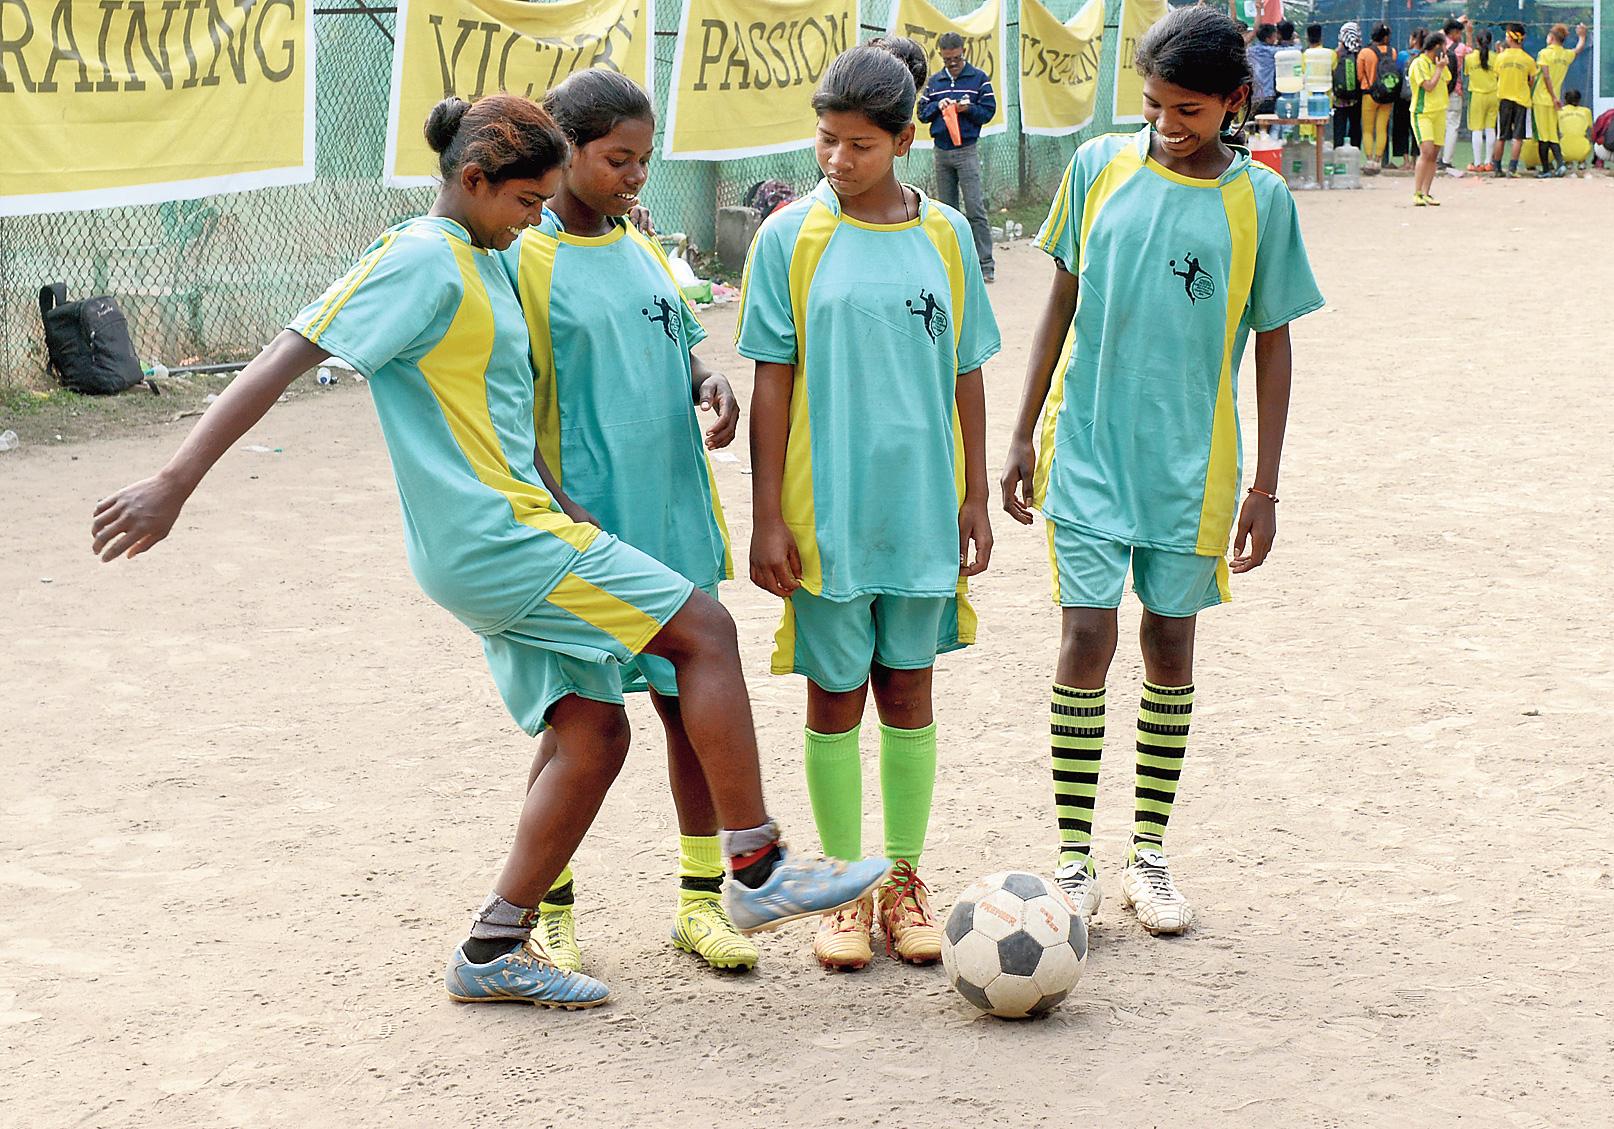 (From left) Sumita Hembram, Didimani Baske, Sihwanti Hansda and Arpita Murmu from Birbhum at the Punjab Club ground on Saturday.